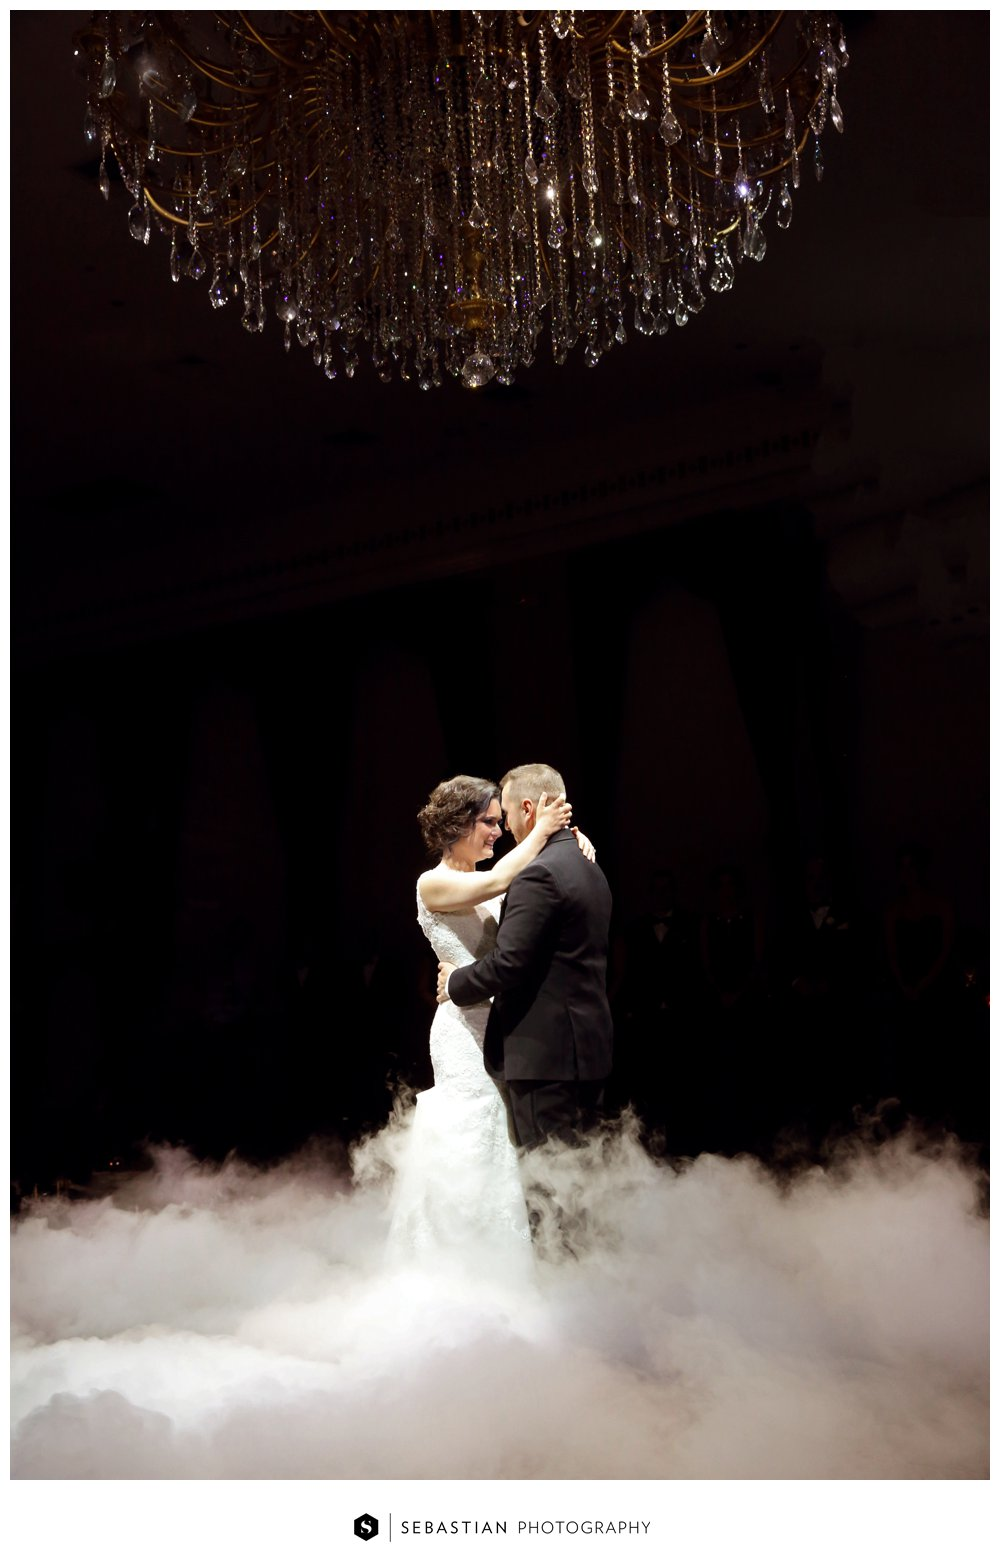 Sebastian Photography_NJ Wedding_NJWedding Photographer_Fall Wedding_The Estate at Florentine Gardens_7062.jpg